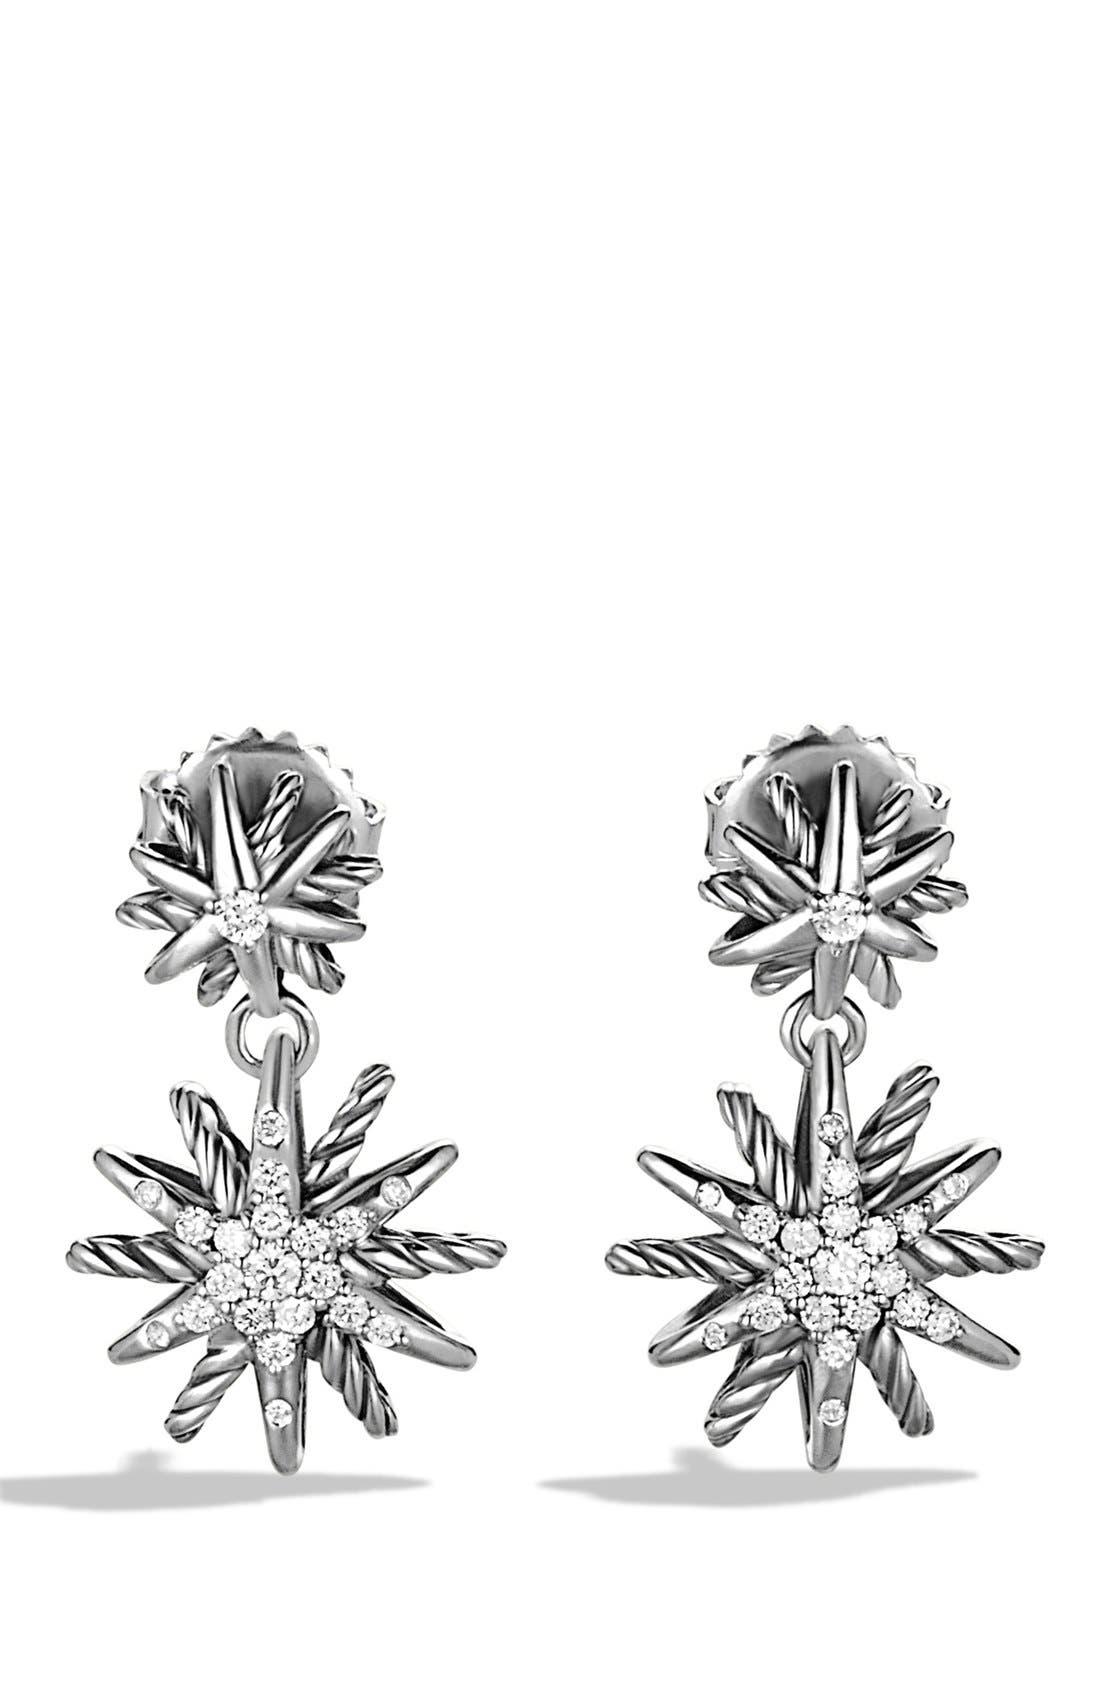 DAVID YURMAN 'Starburst' Double-Drop Earrings with Diamonds, Main, color, DIAMOND